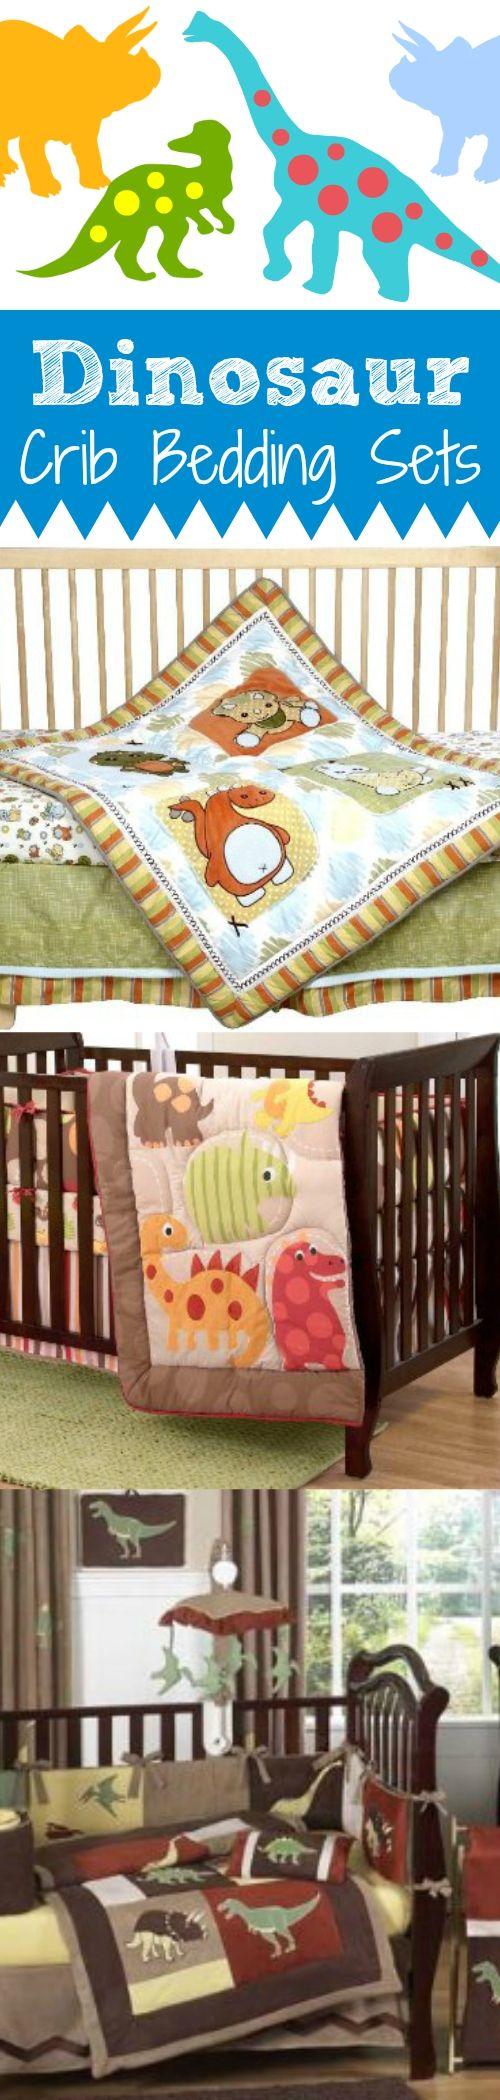 25 best images about Dinosaur Crib Bedding on Pinterest ...